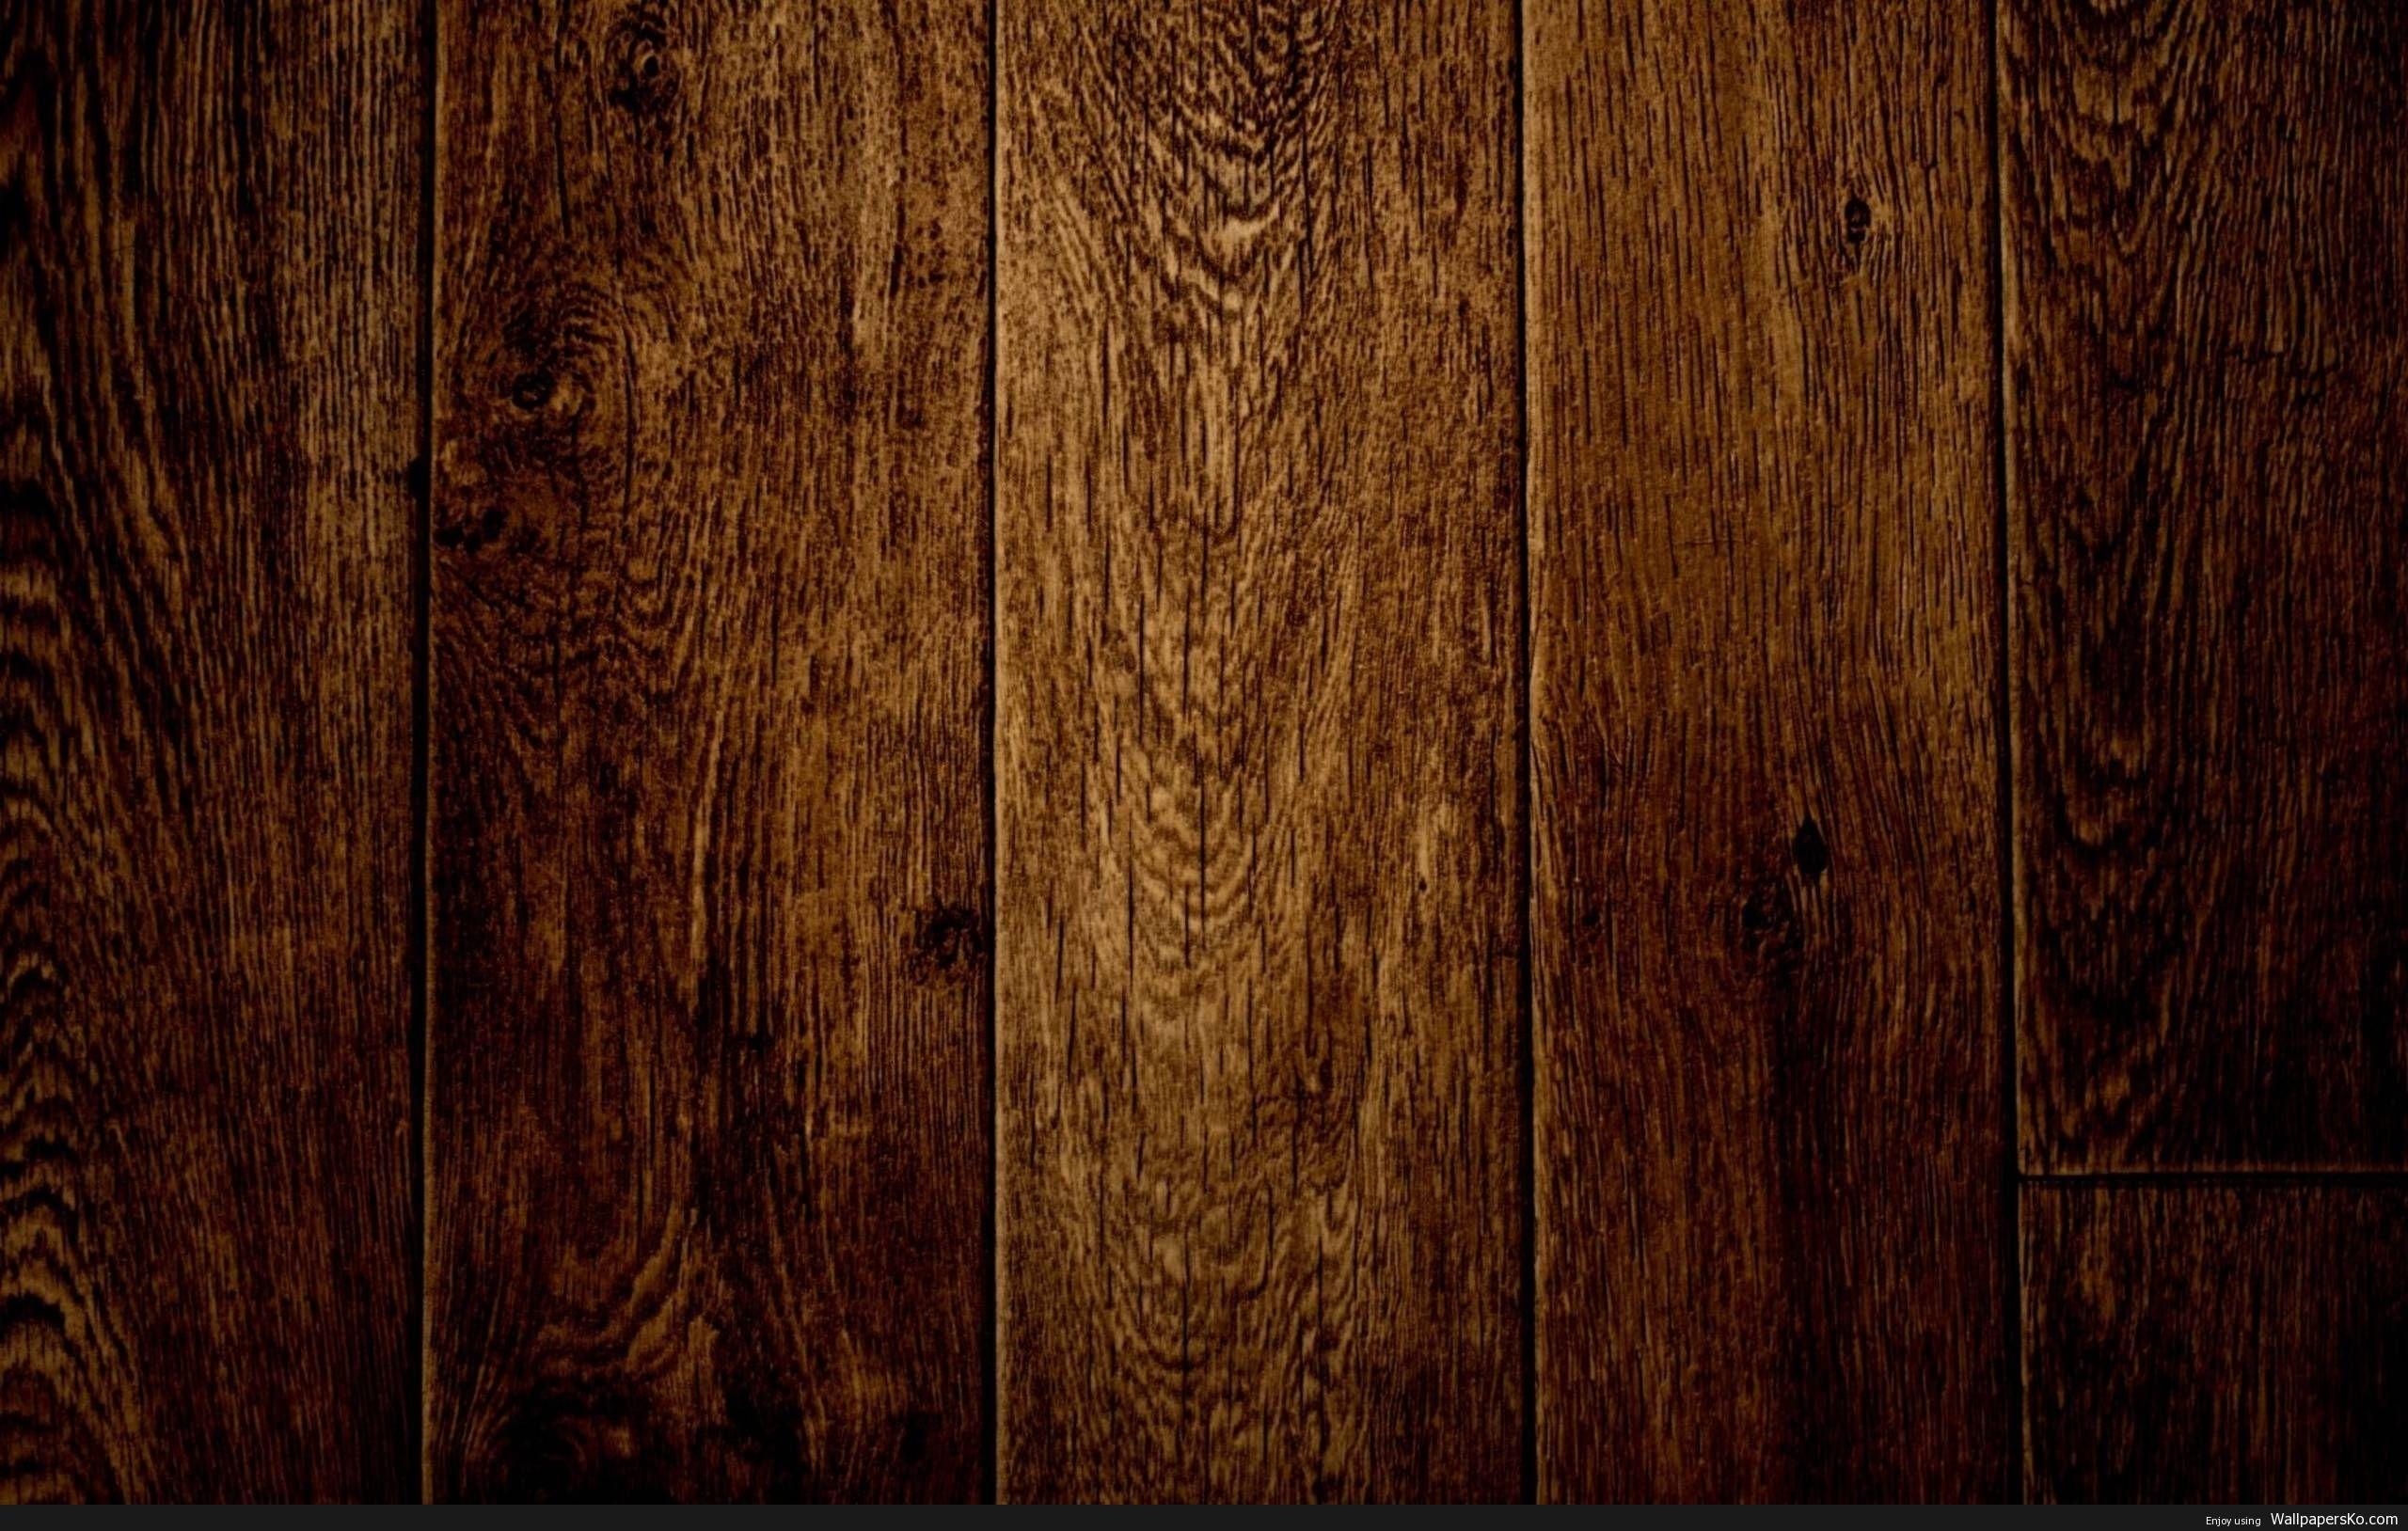 Woodgrain Desktop Background Http Wallpapersko Com Woodgrain Desktop Background Html Hd Wallpapers Wood Wallpaper Wood Grain Wallpaper Dark Wood Wallpaper